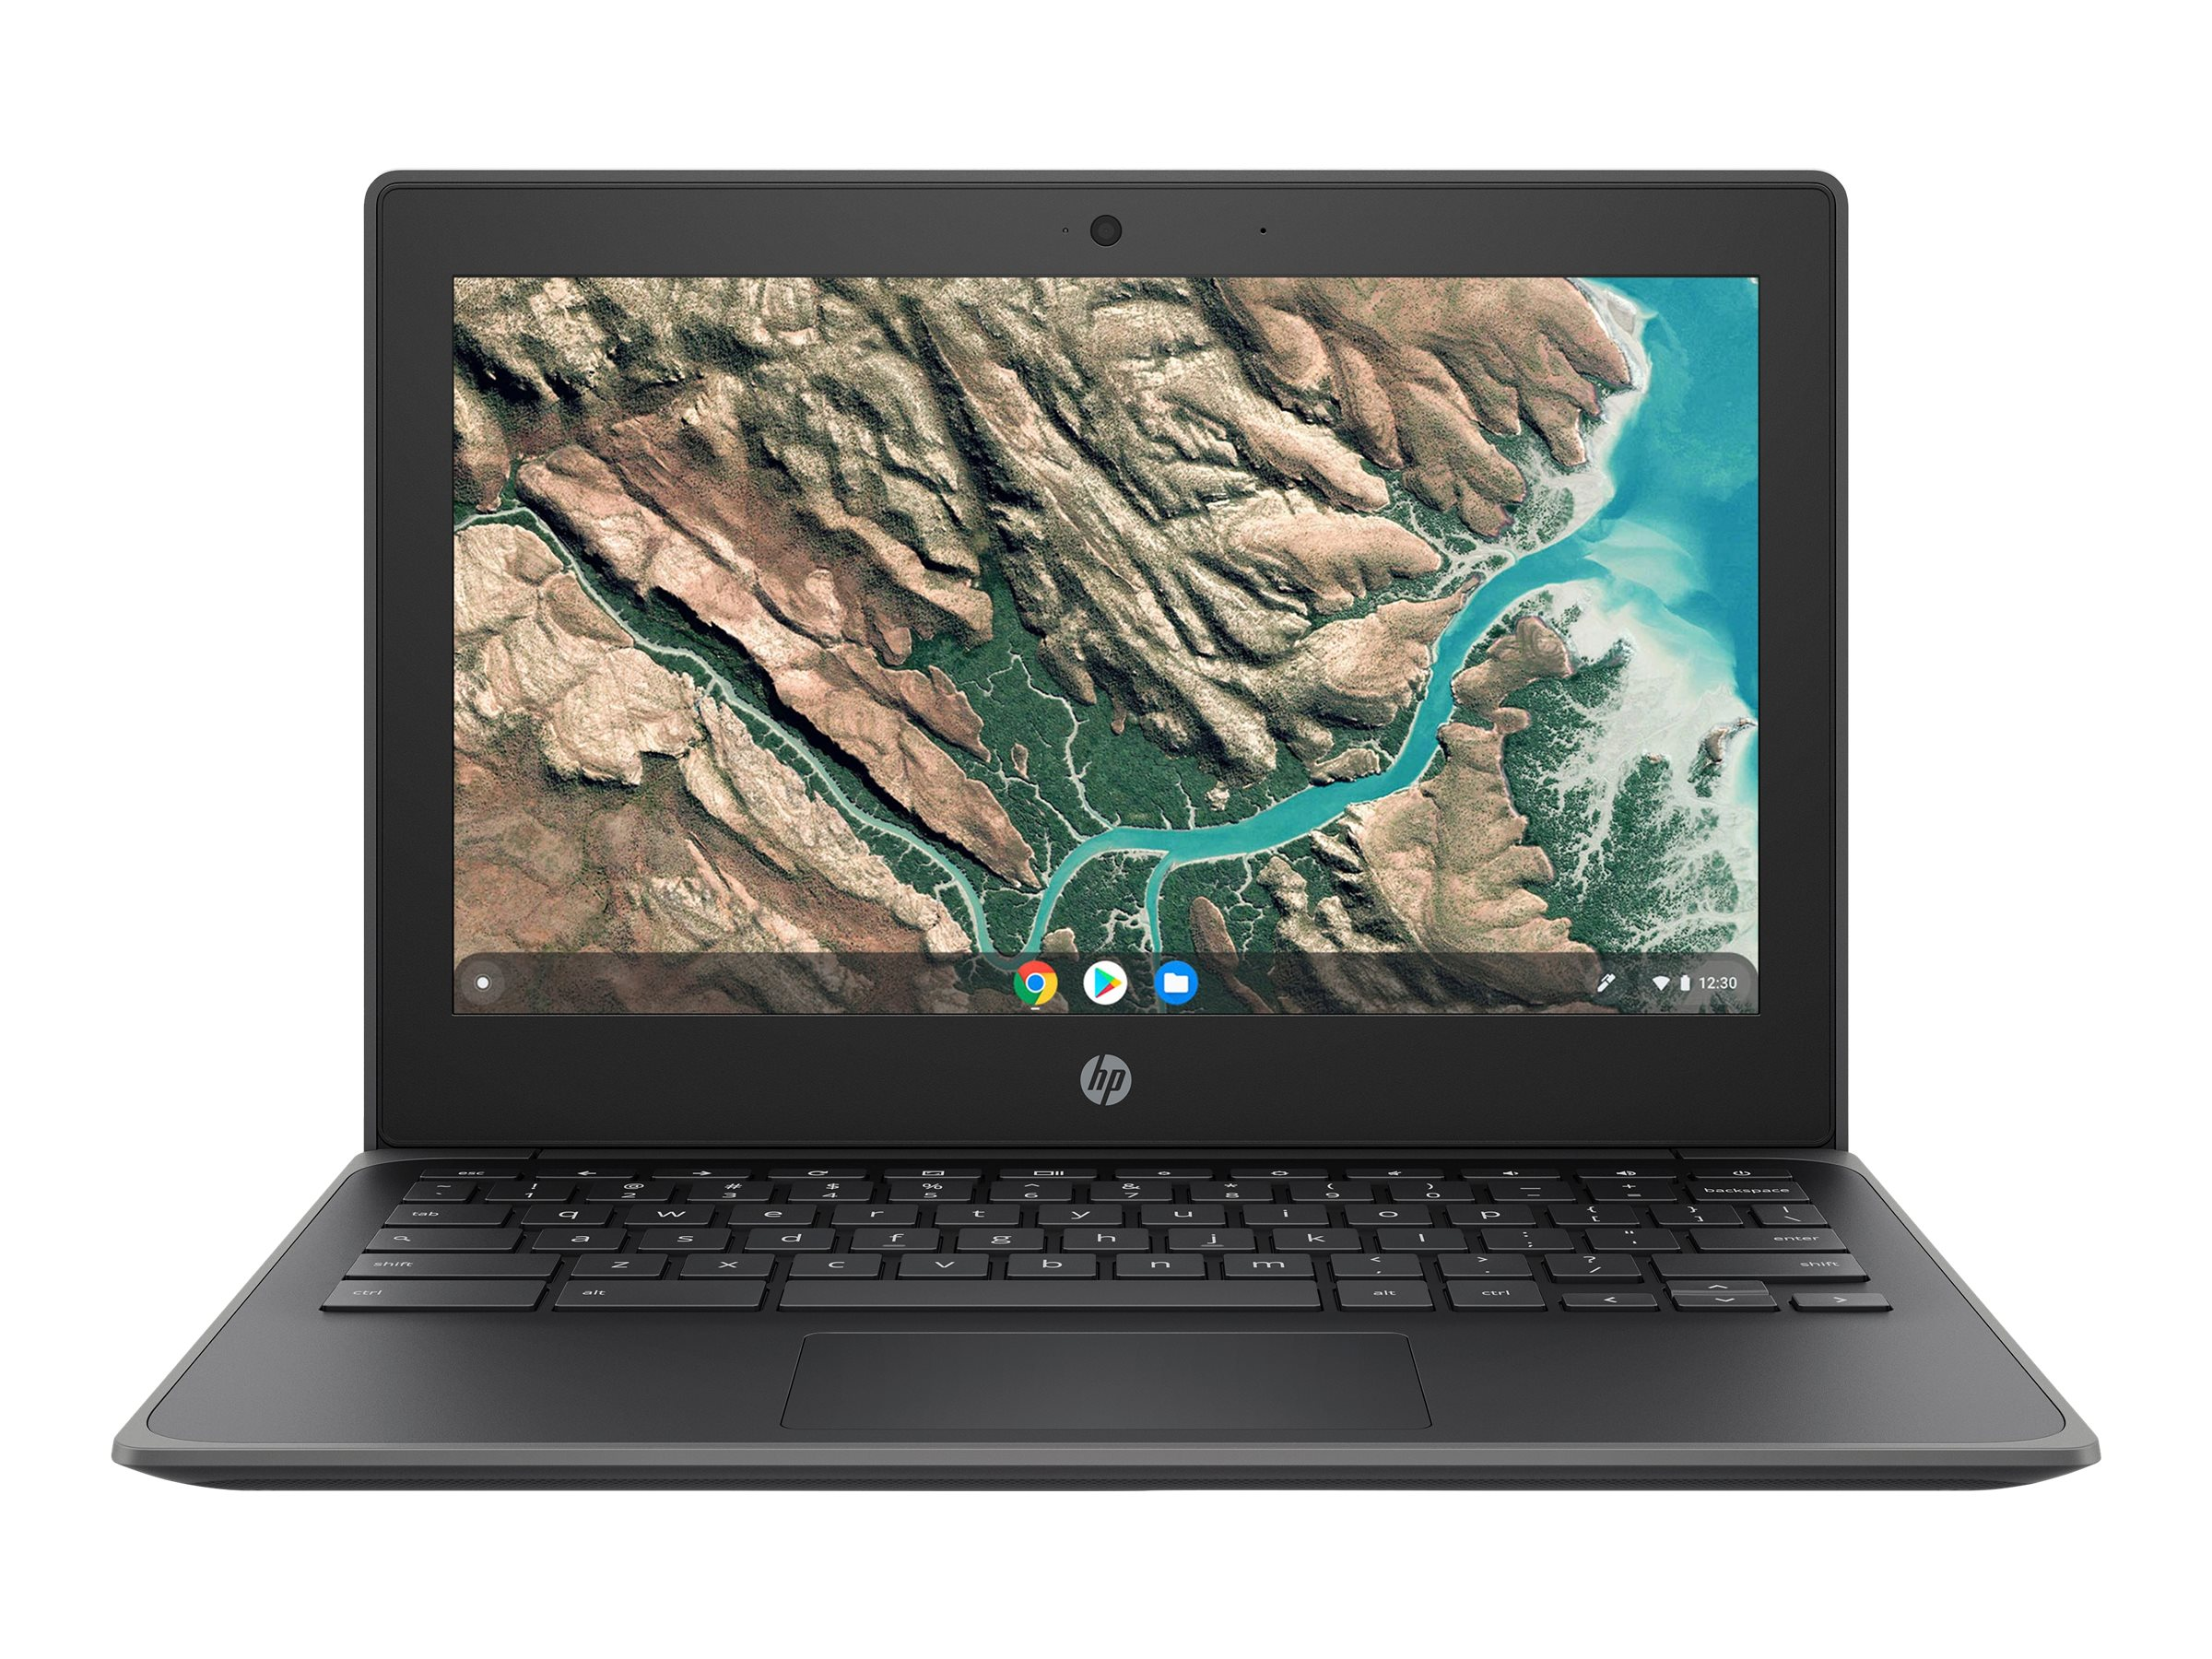 HP Chromebook 11 G8 - Education Edition - 11.6